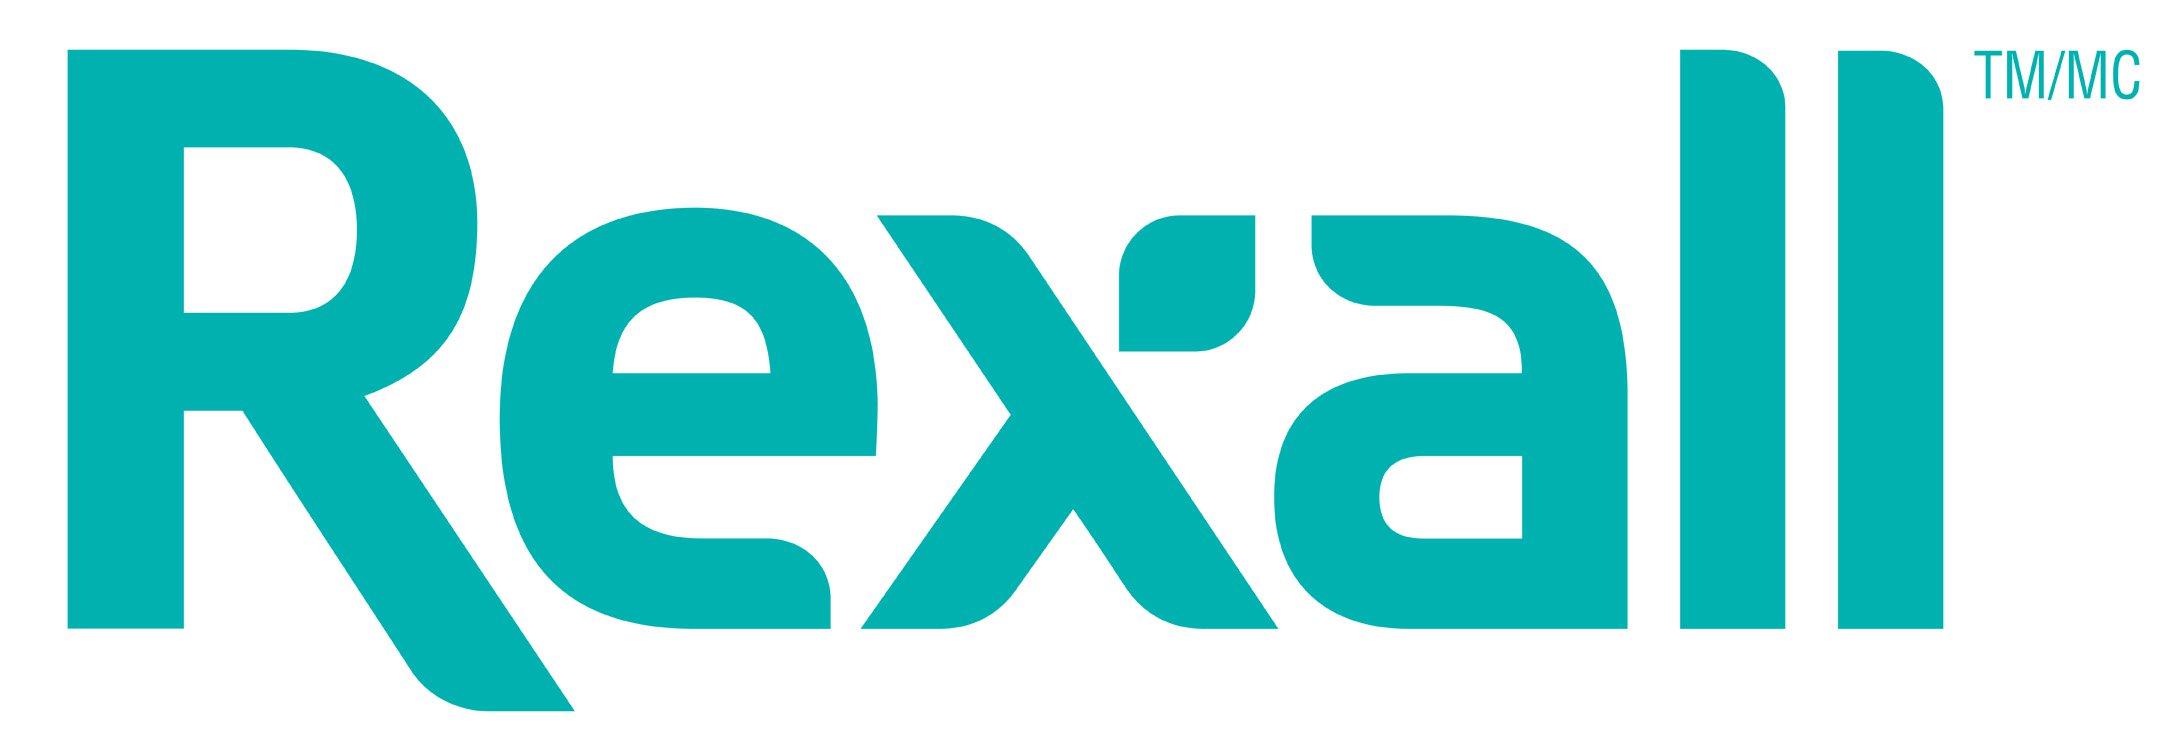 rexall-logo.jpg